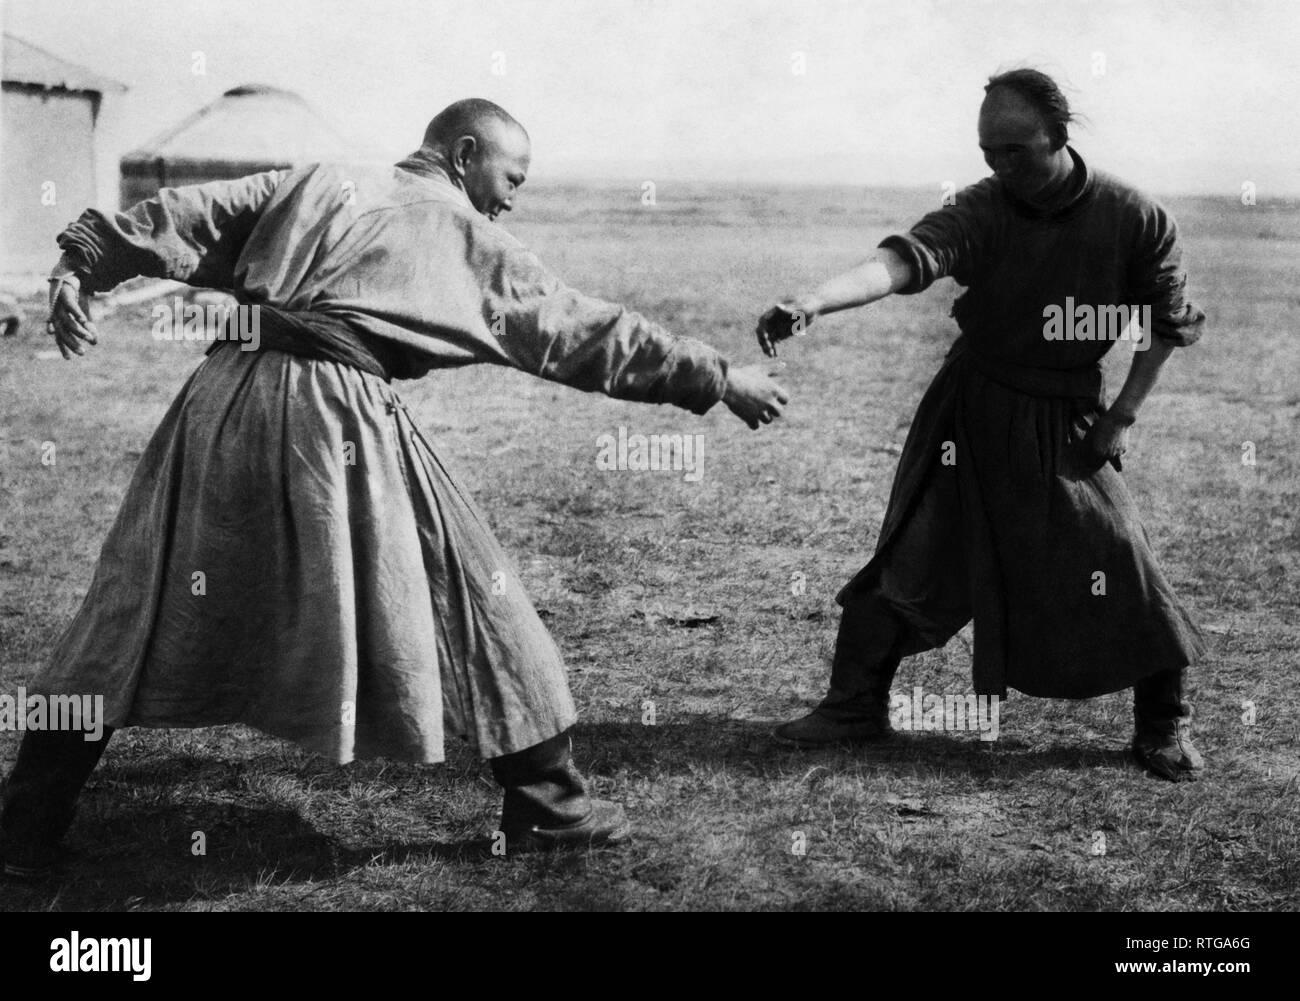 asia, mongolia, fighting exercises in eastern mongolia, 1920 - Stock Image